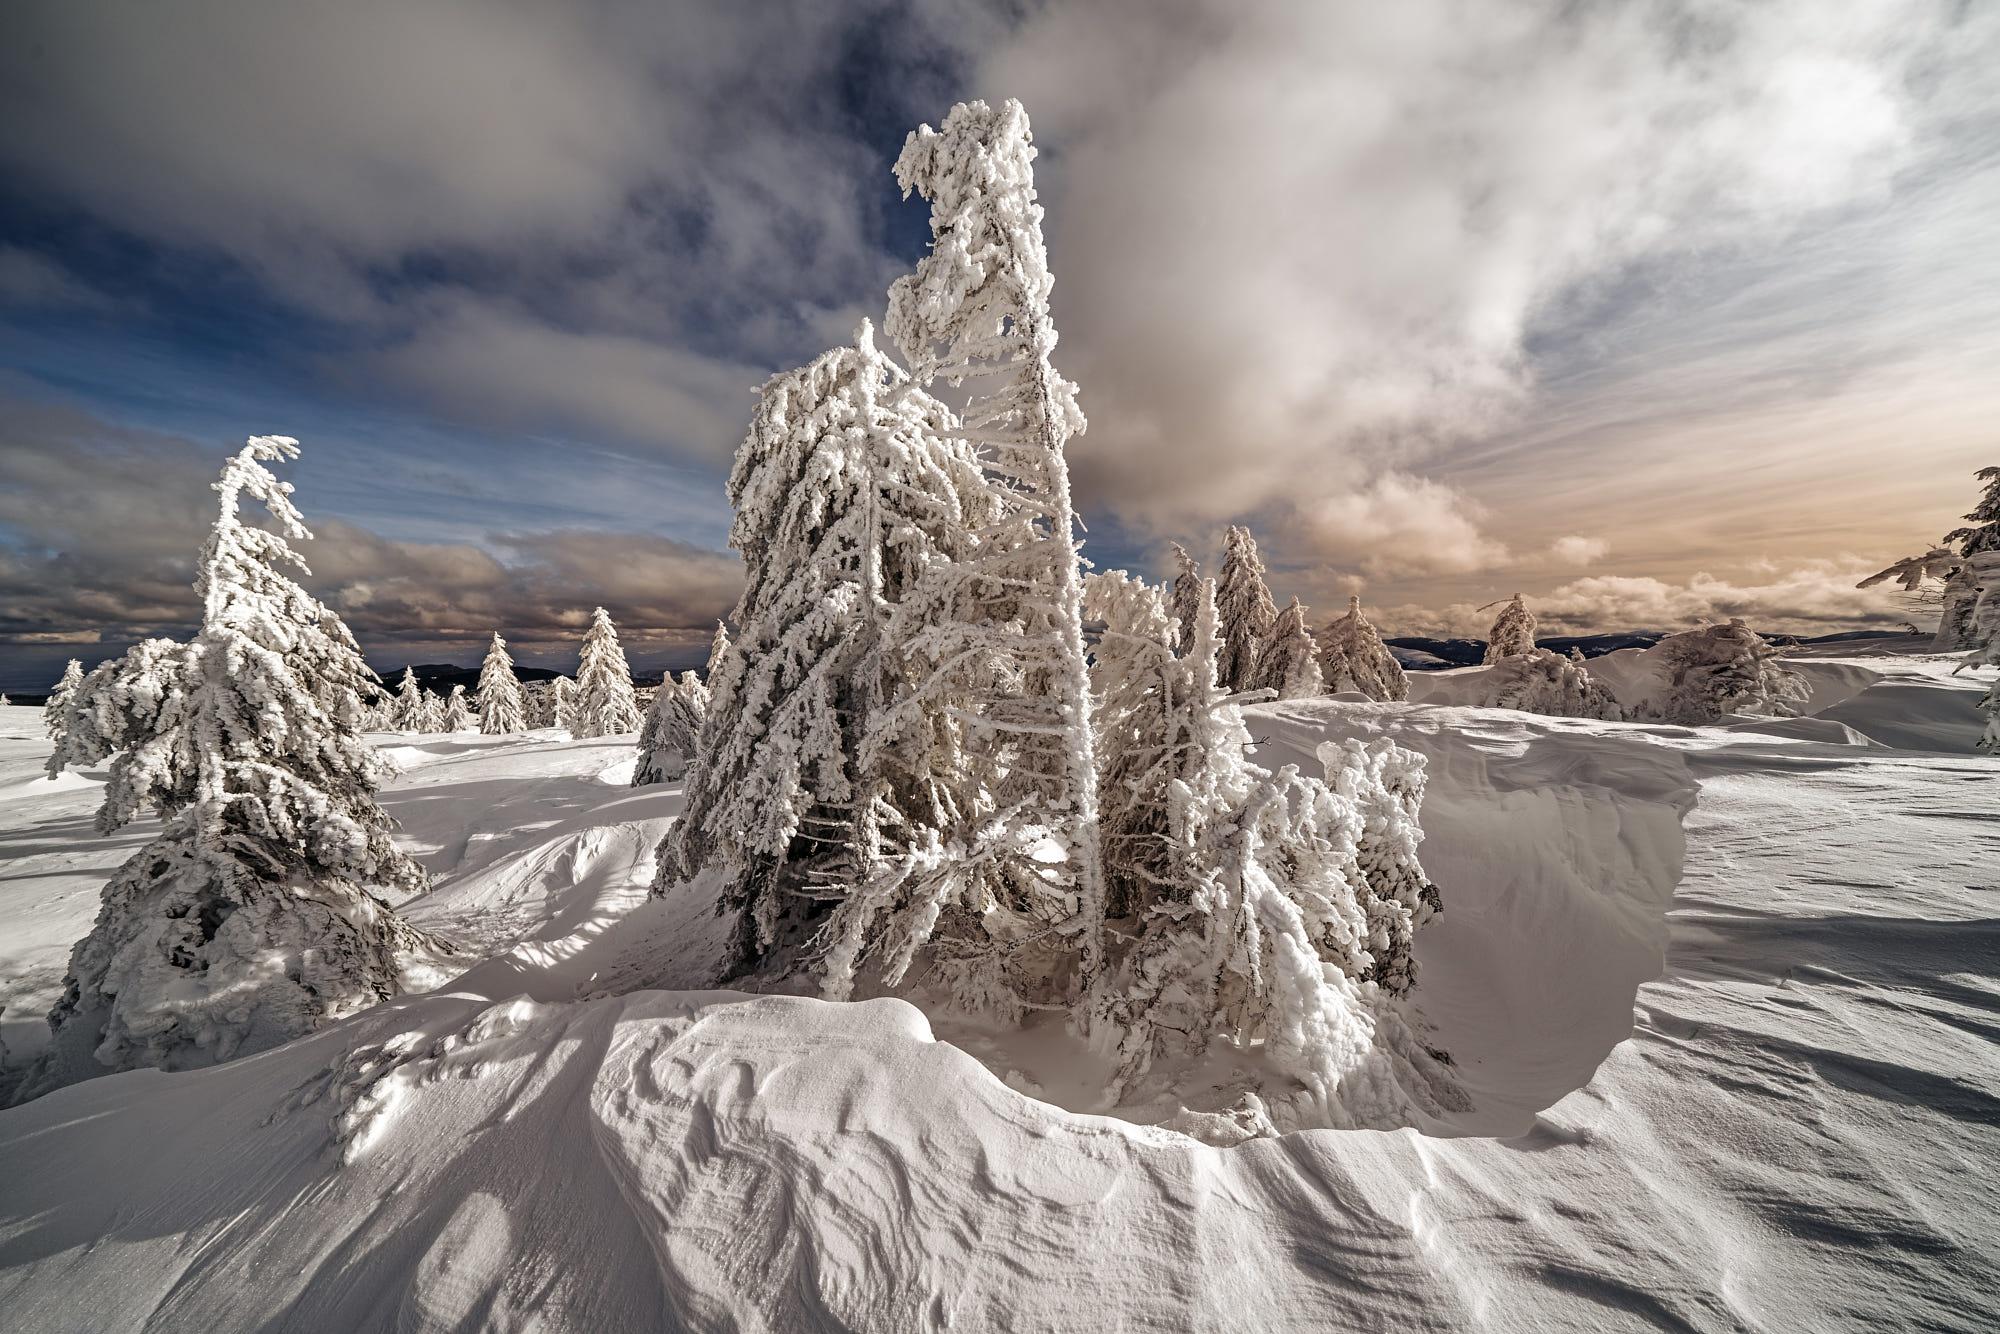 Cloud Snow Fir Tree 2000x1334